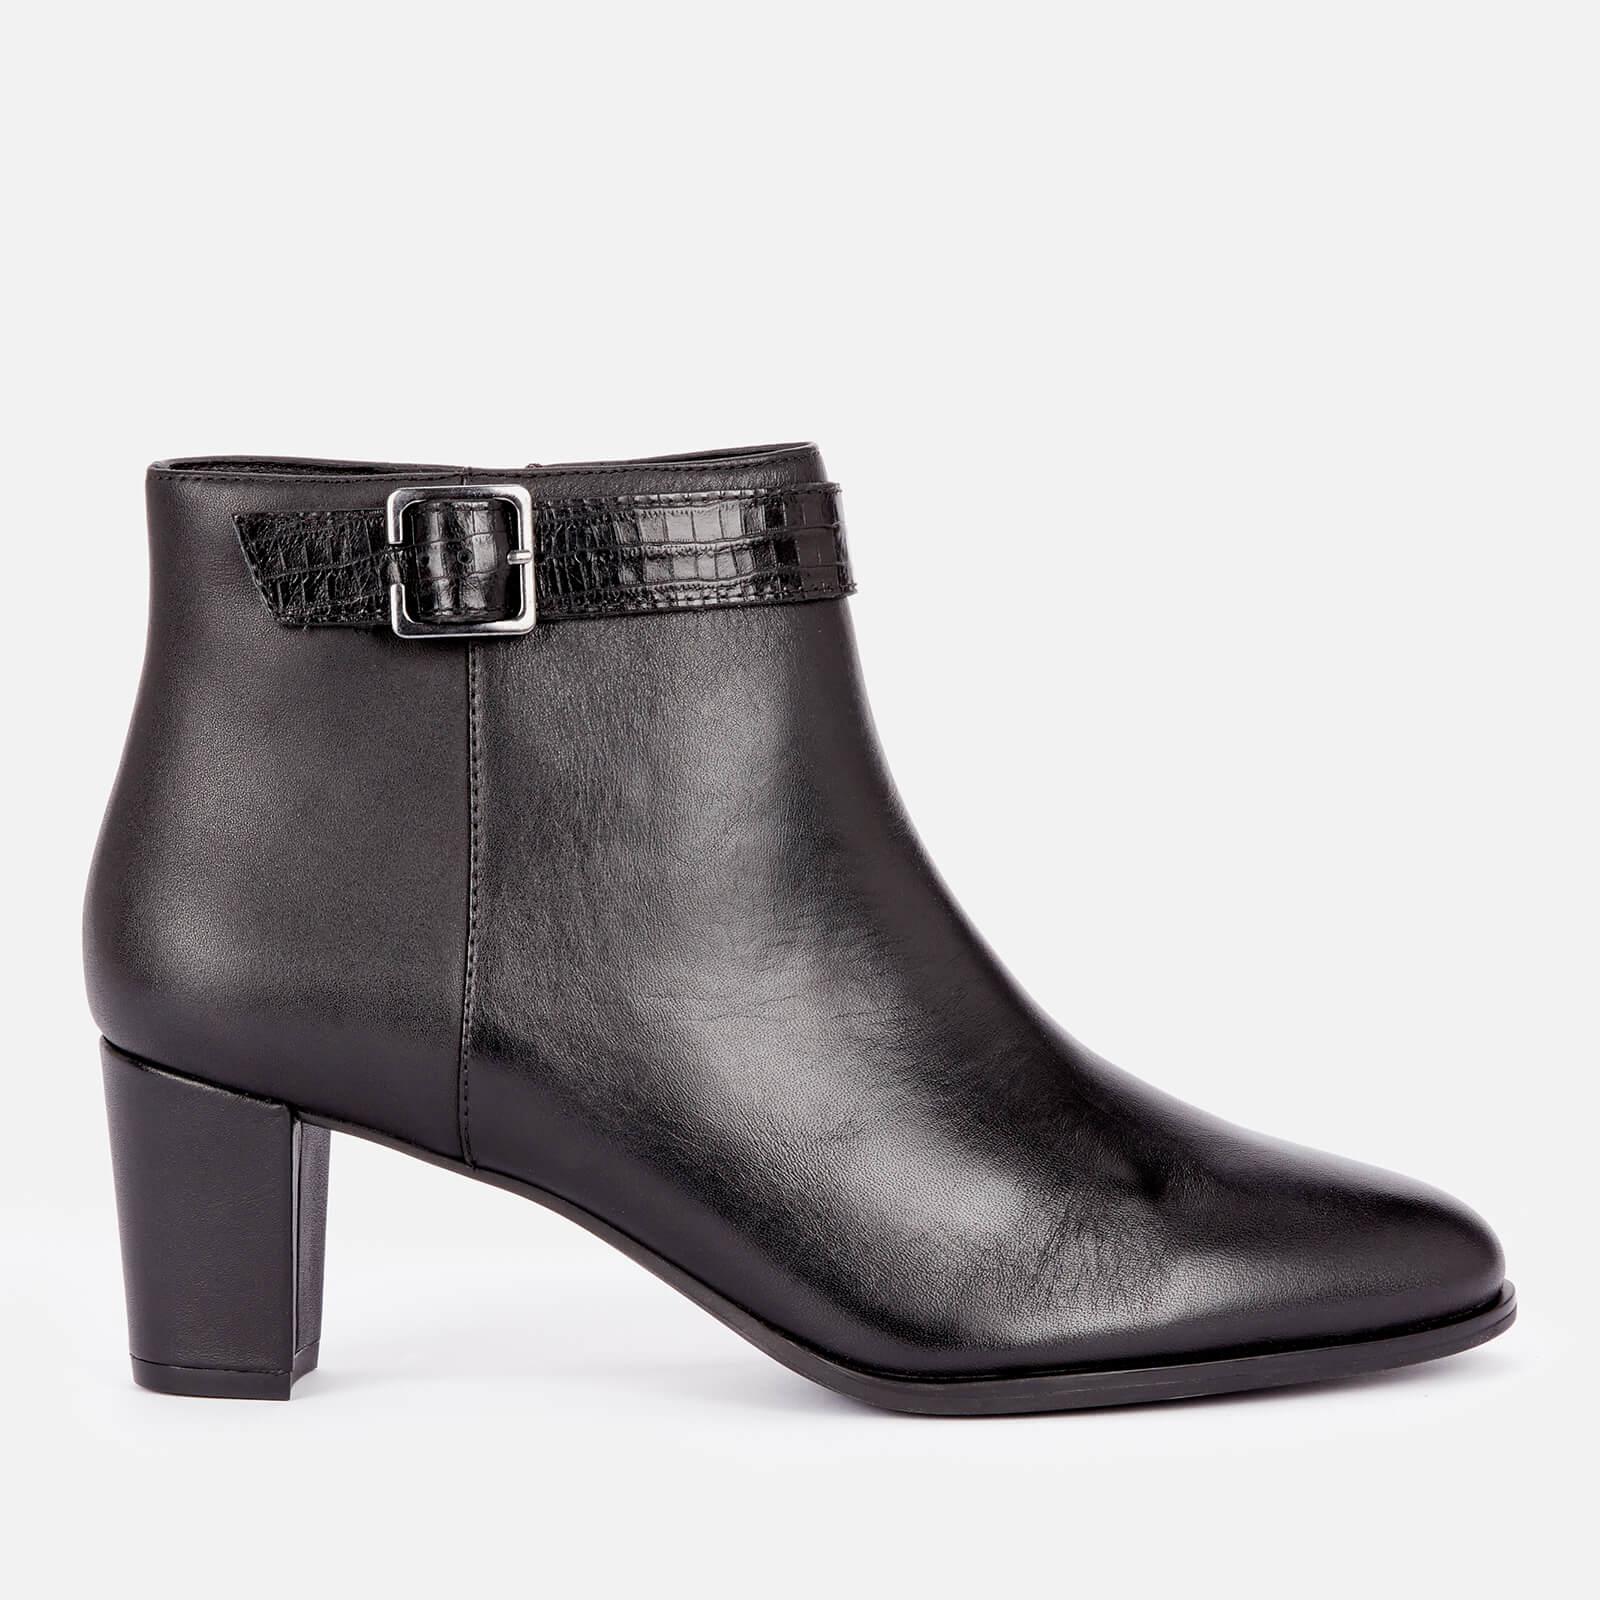 Clarks Women's Kaylin60 Leather Heeled Ankle Boots - Black - Uk 6